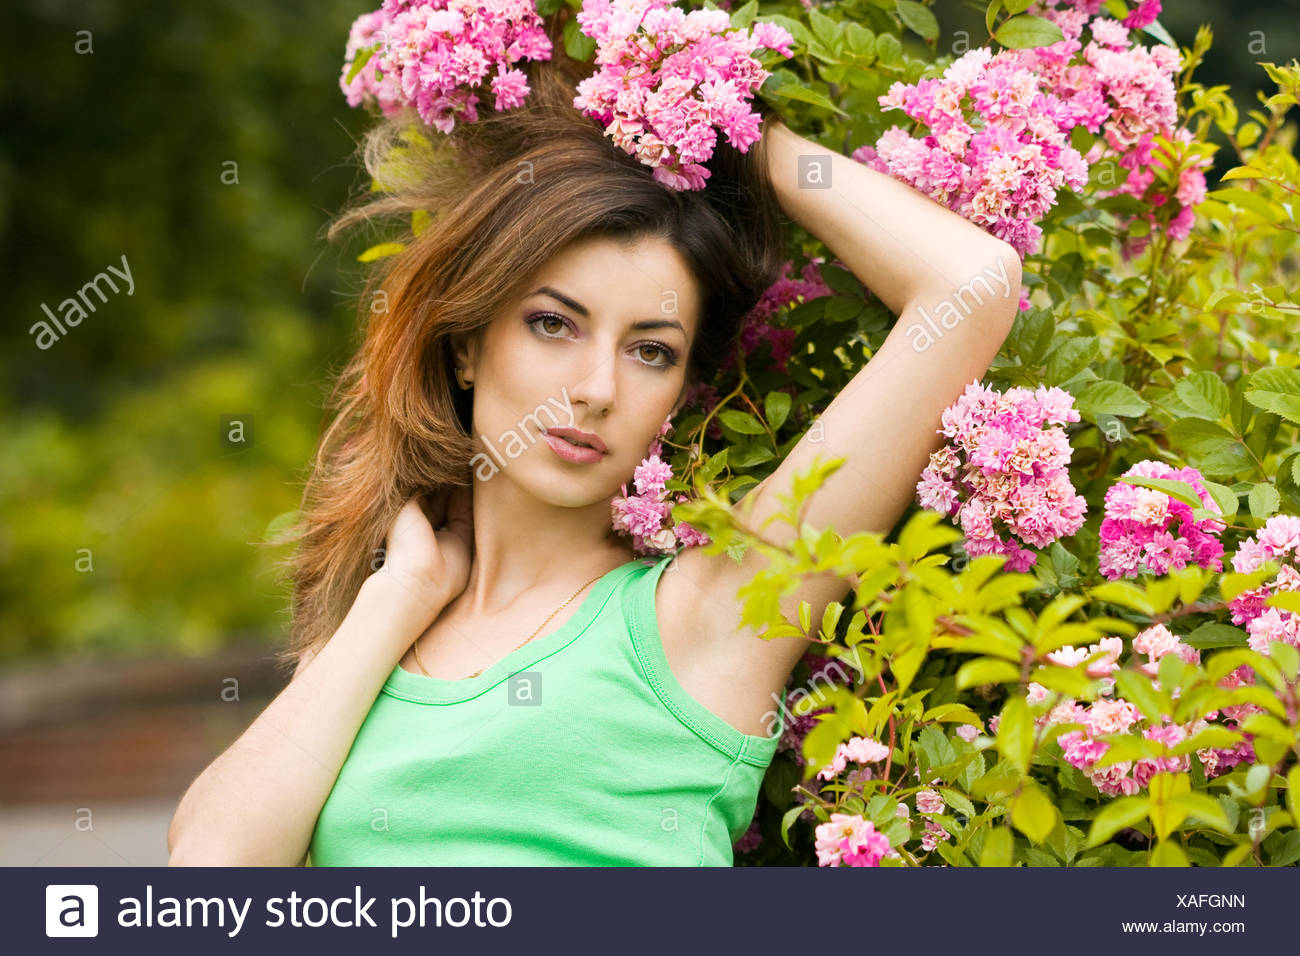 Beautiful woman in garden with flowers stock photo 281854881 alamy beautiful woman in garden with flowers izmirmasajfo